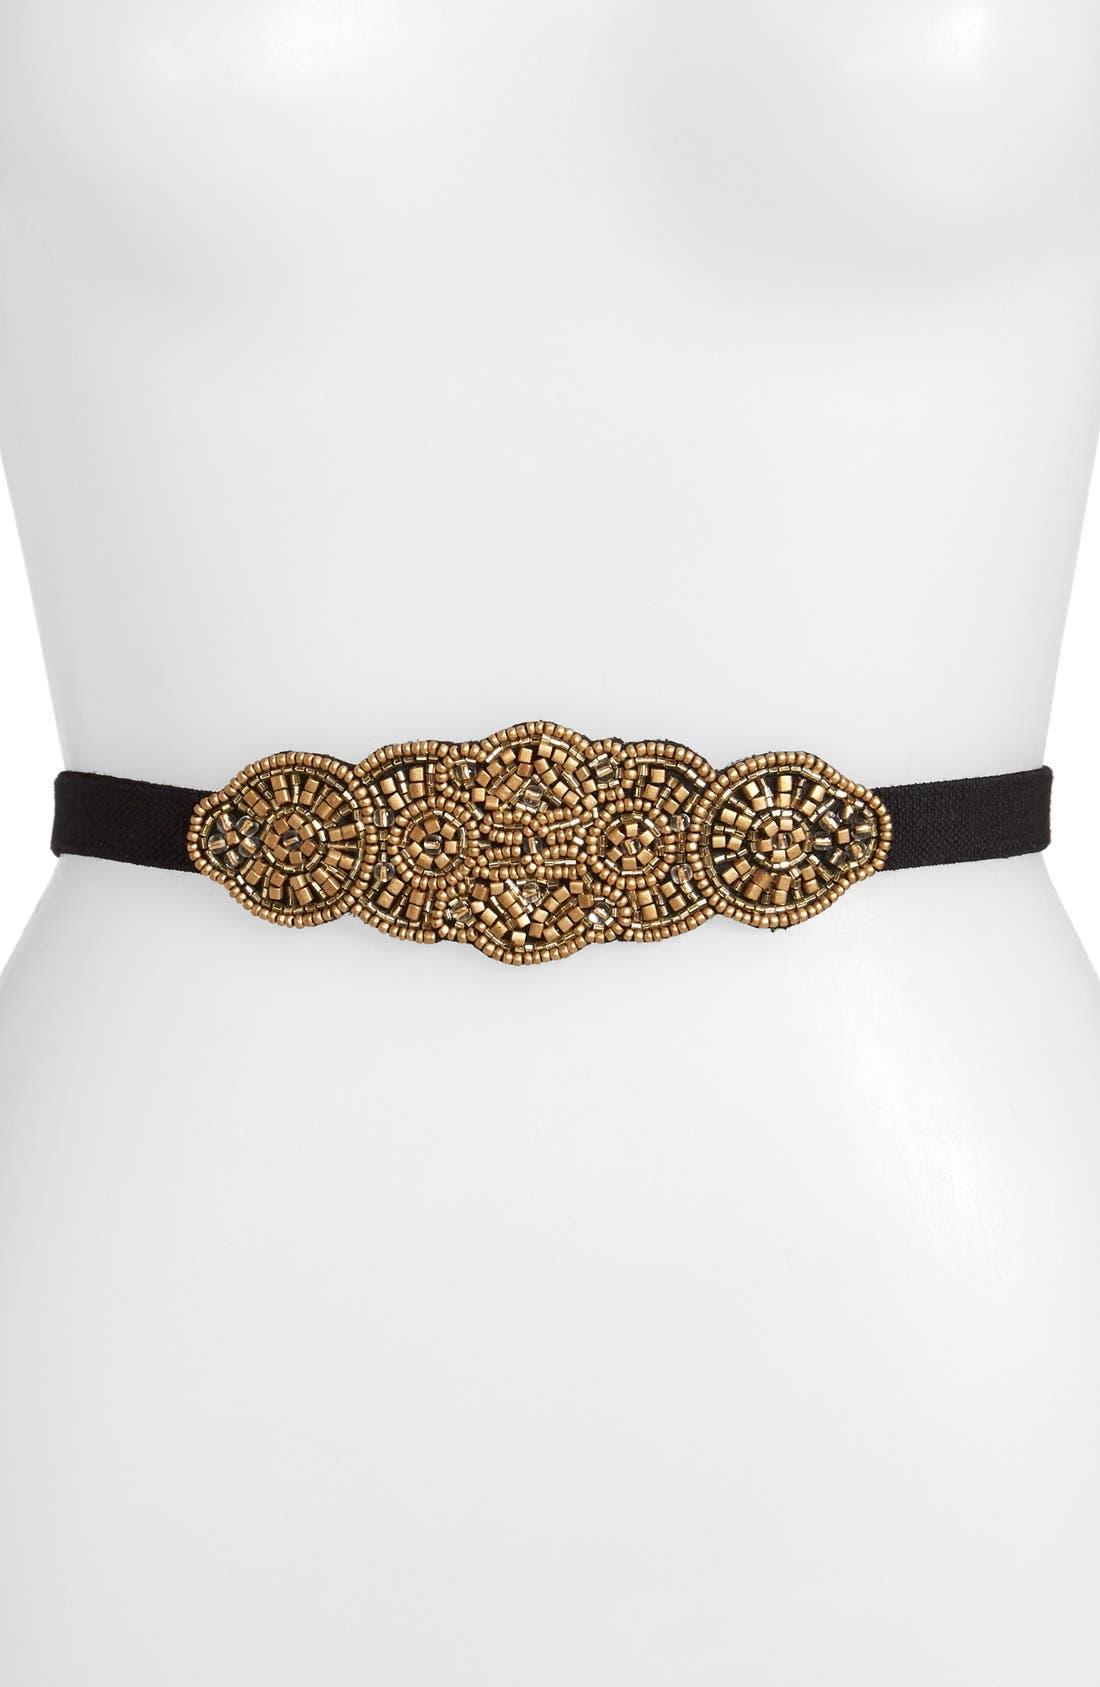 Main Image - Glint 'Medallion' Beaded Stretch Belt